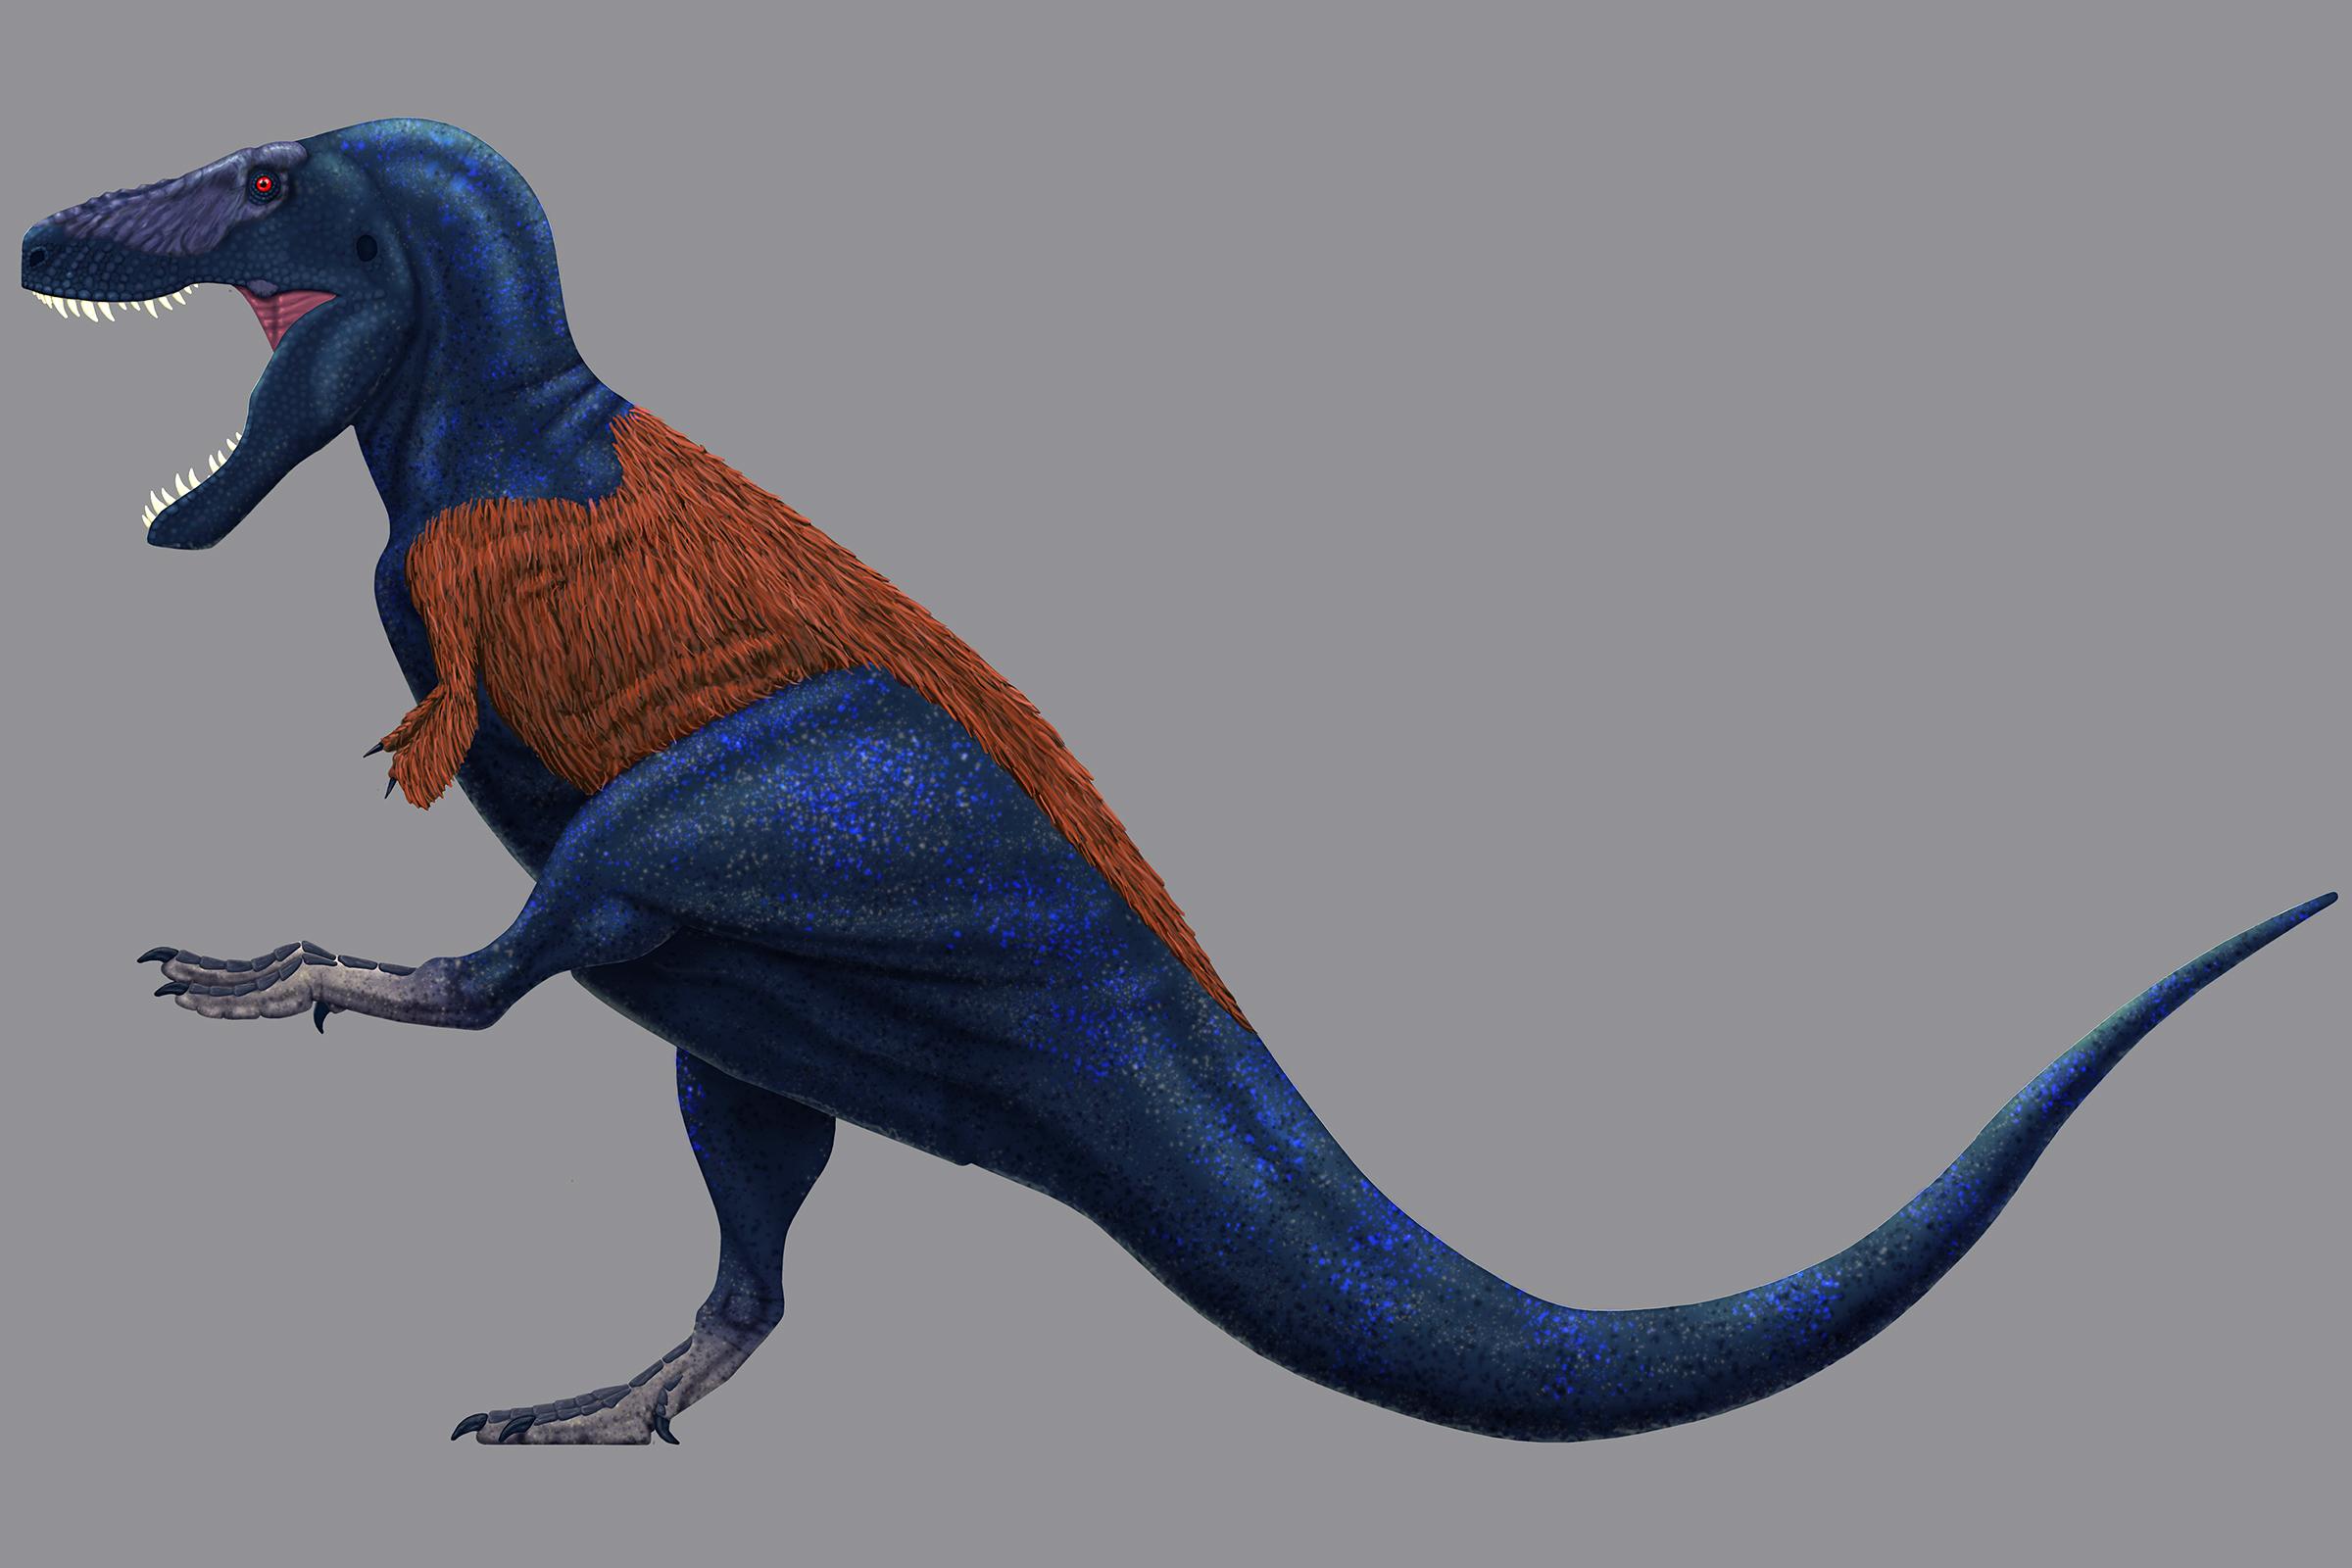 Tyrannosaurus rex painting